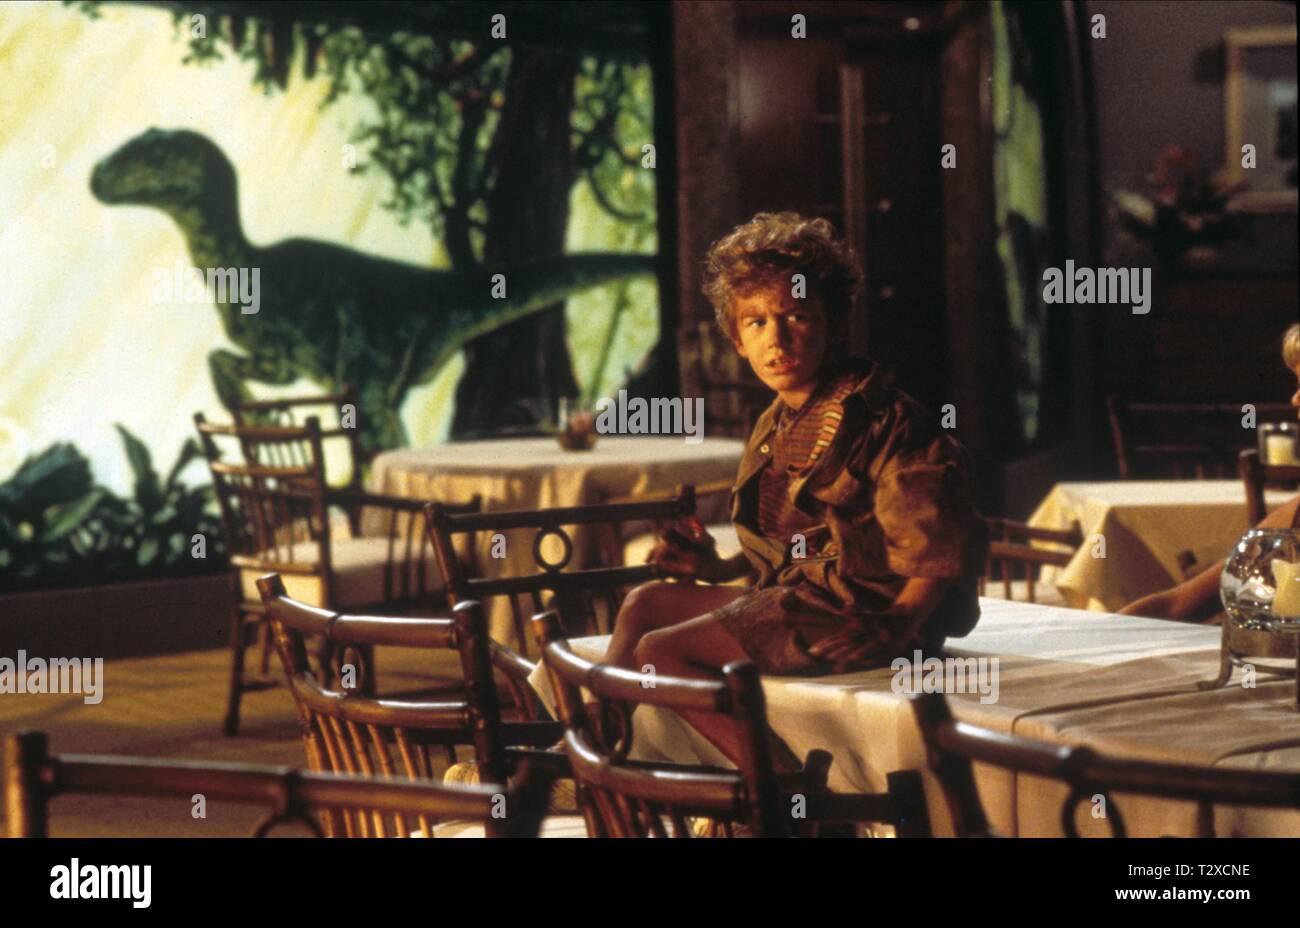 JOSEPH MAZZELLO, JURASSIC PARK, 1993 - Stock Image